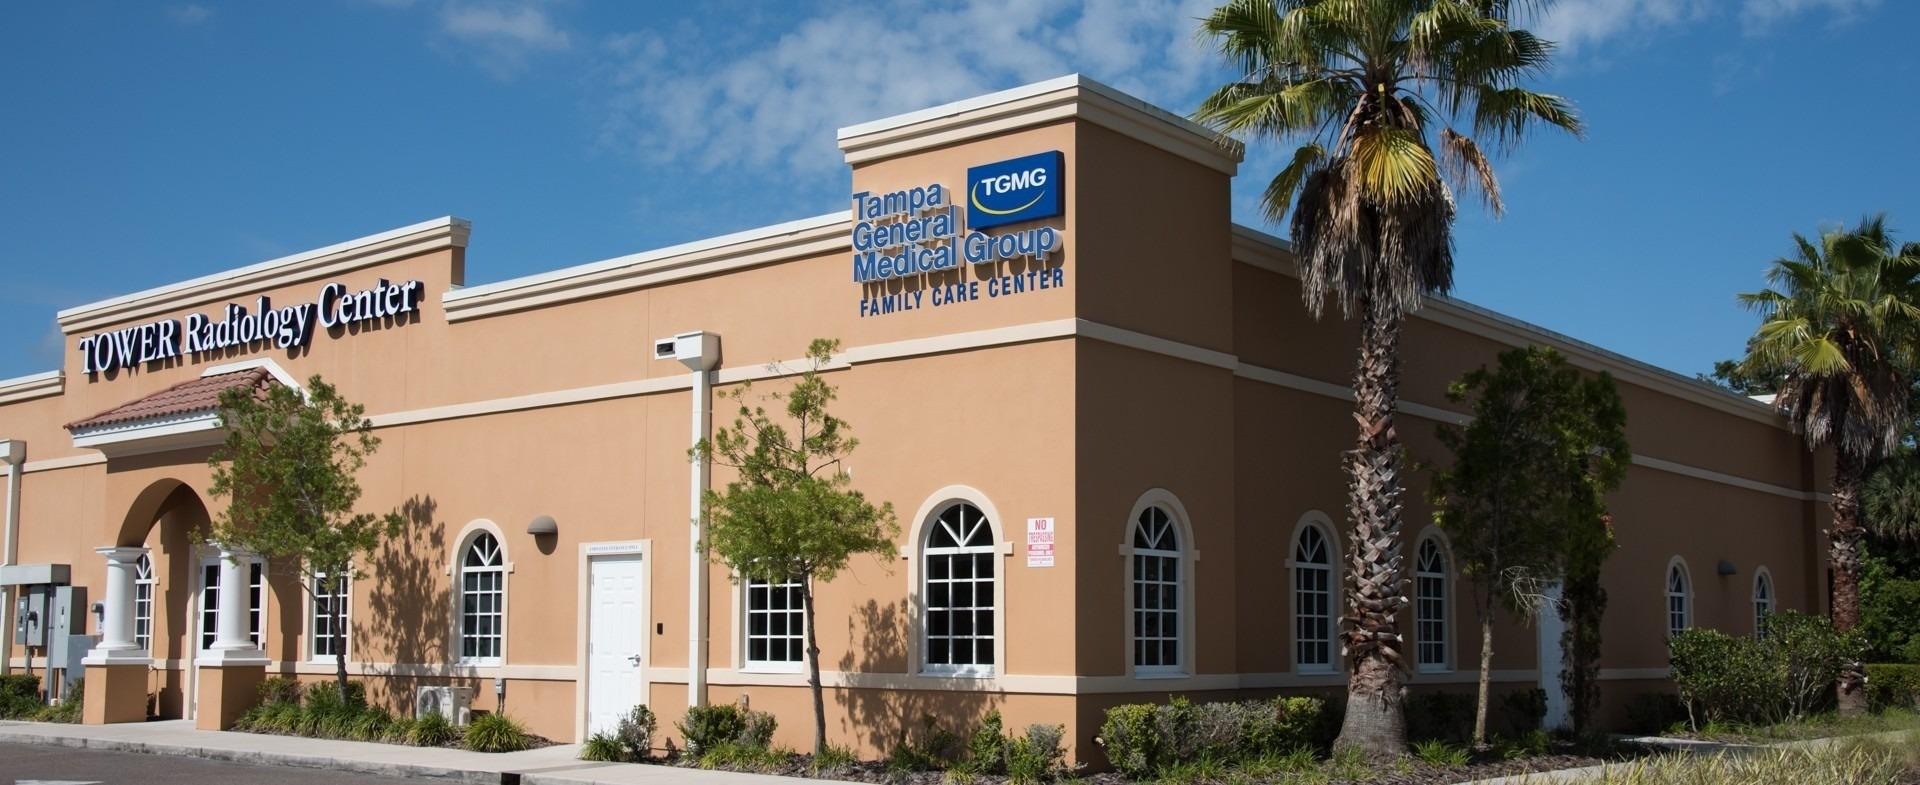 TGMG Wesley Chapel Location   Tampa General Hospital